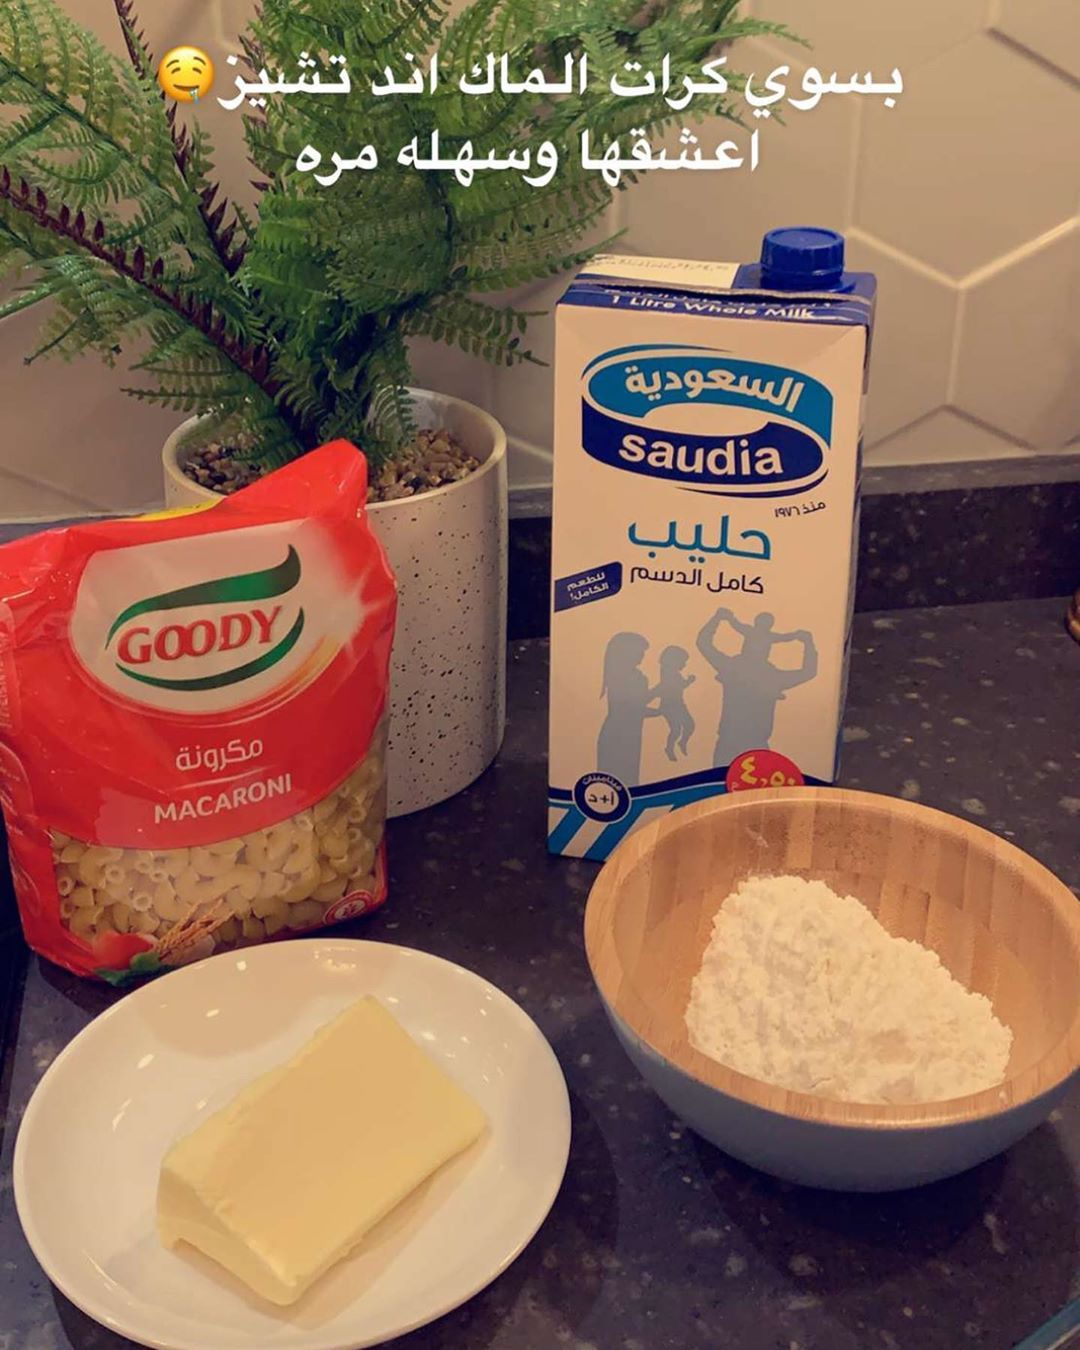 191 Likes 6 Comments سناب رغد دايز Rghd Mf On Instagram كرات الماك اند تشيز على طريقة رغد دايز Cooking Food Macaroni